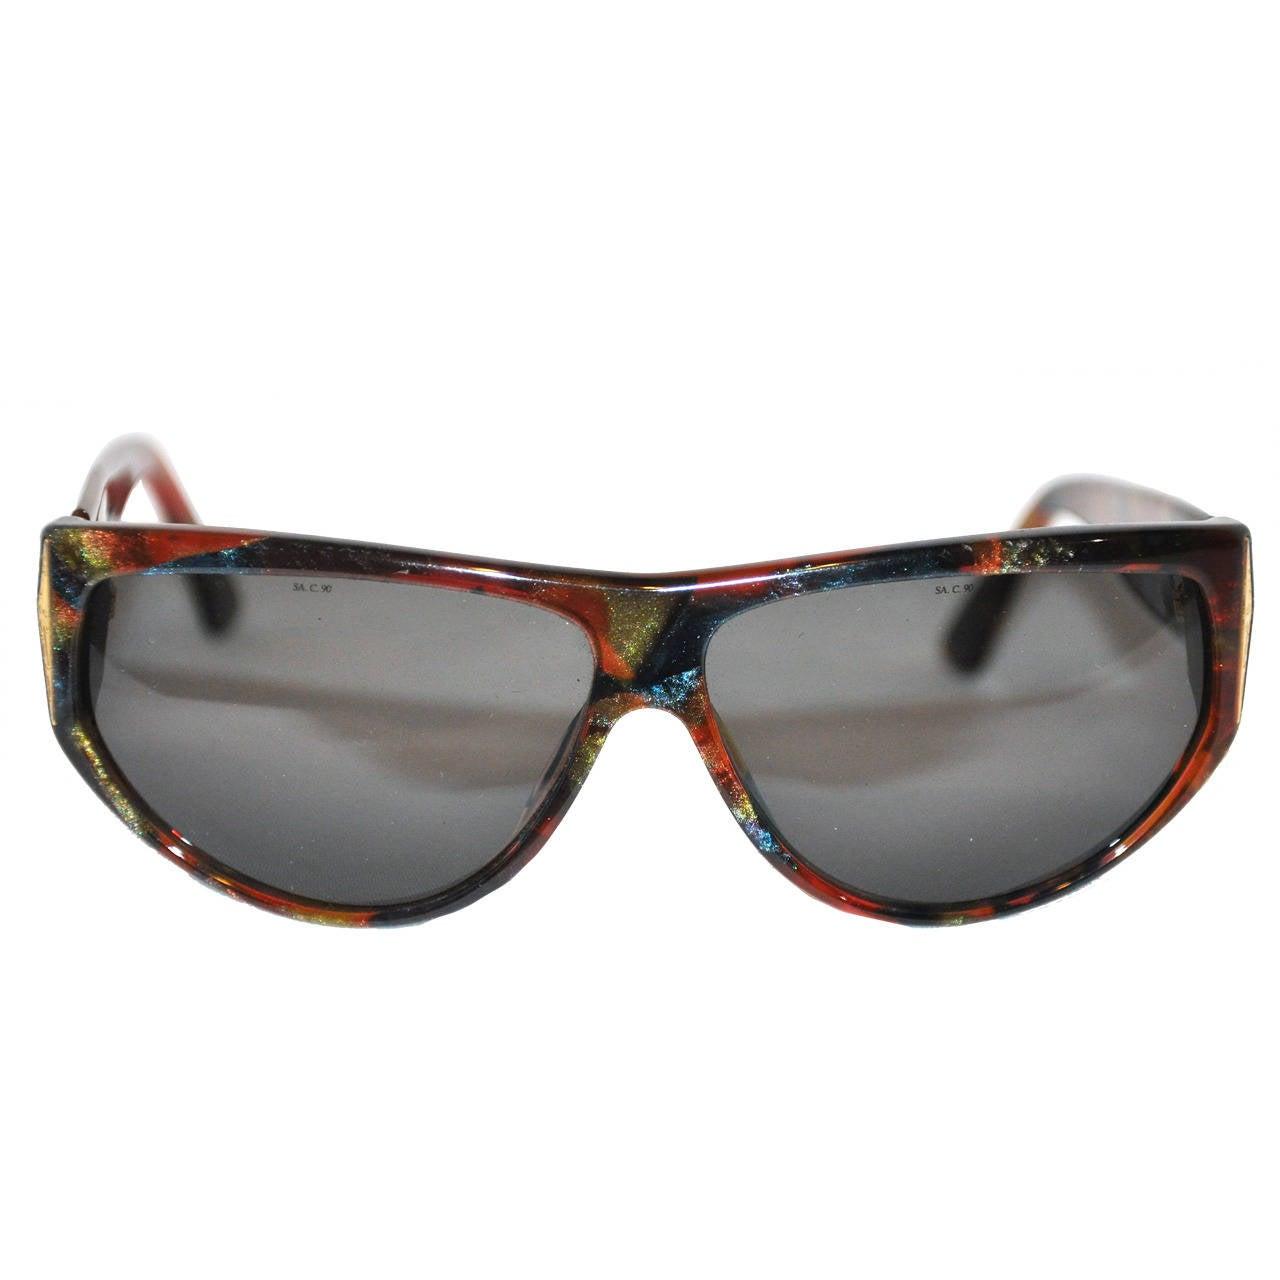 Laura Biagitti Multi-Color Lucite Sunglasses